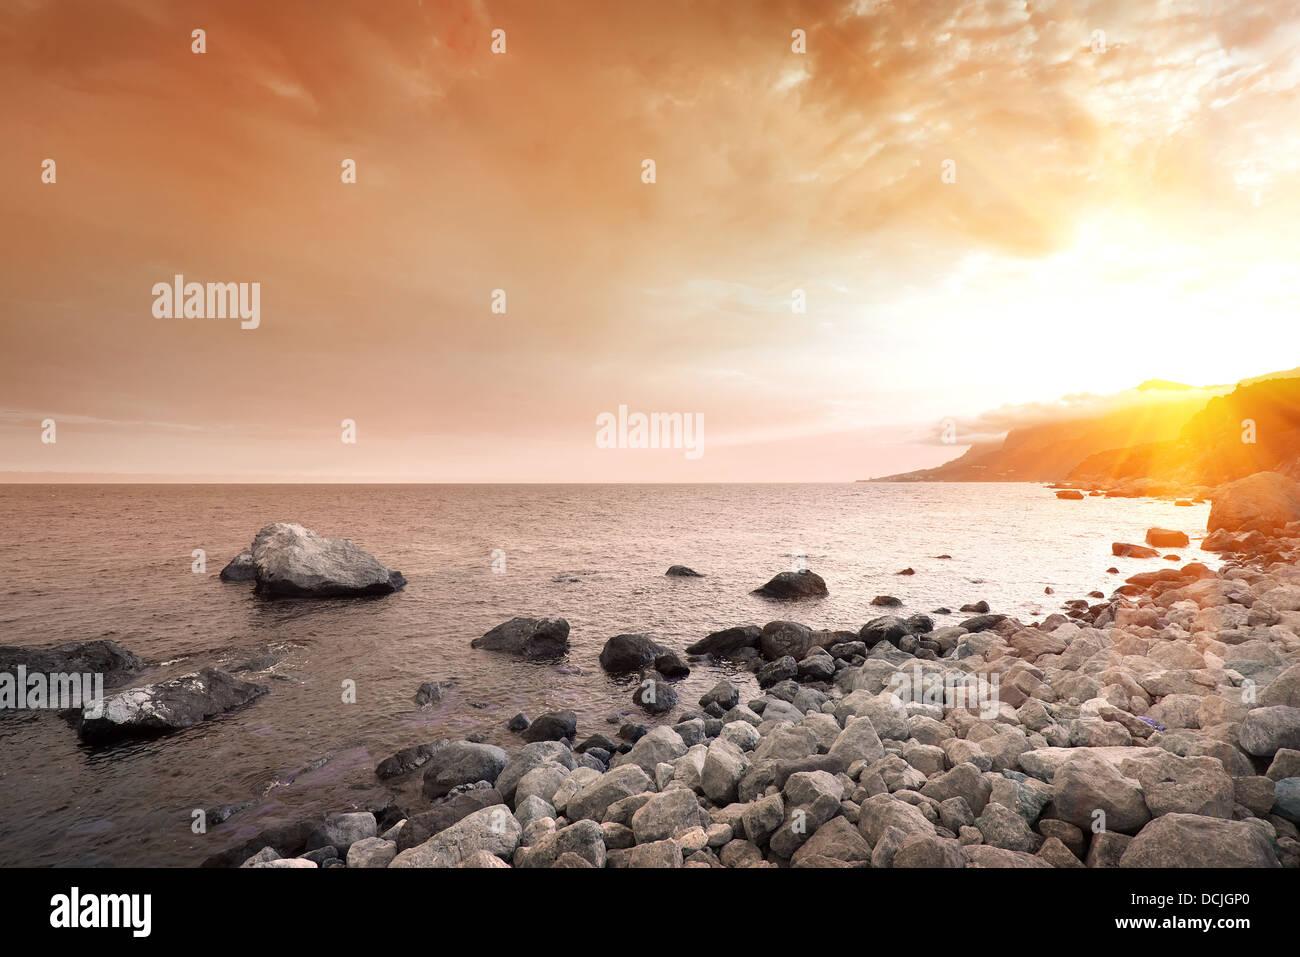 Scenic sunset at Black Sea in Crimea - Stock Image